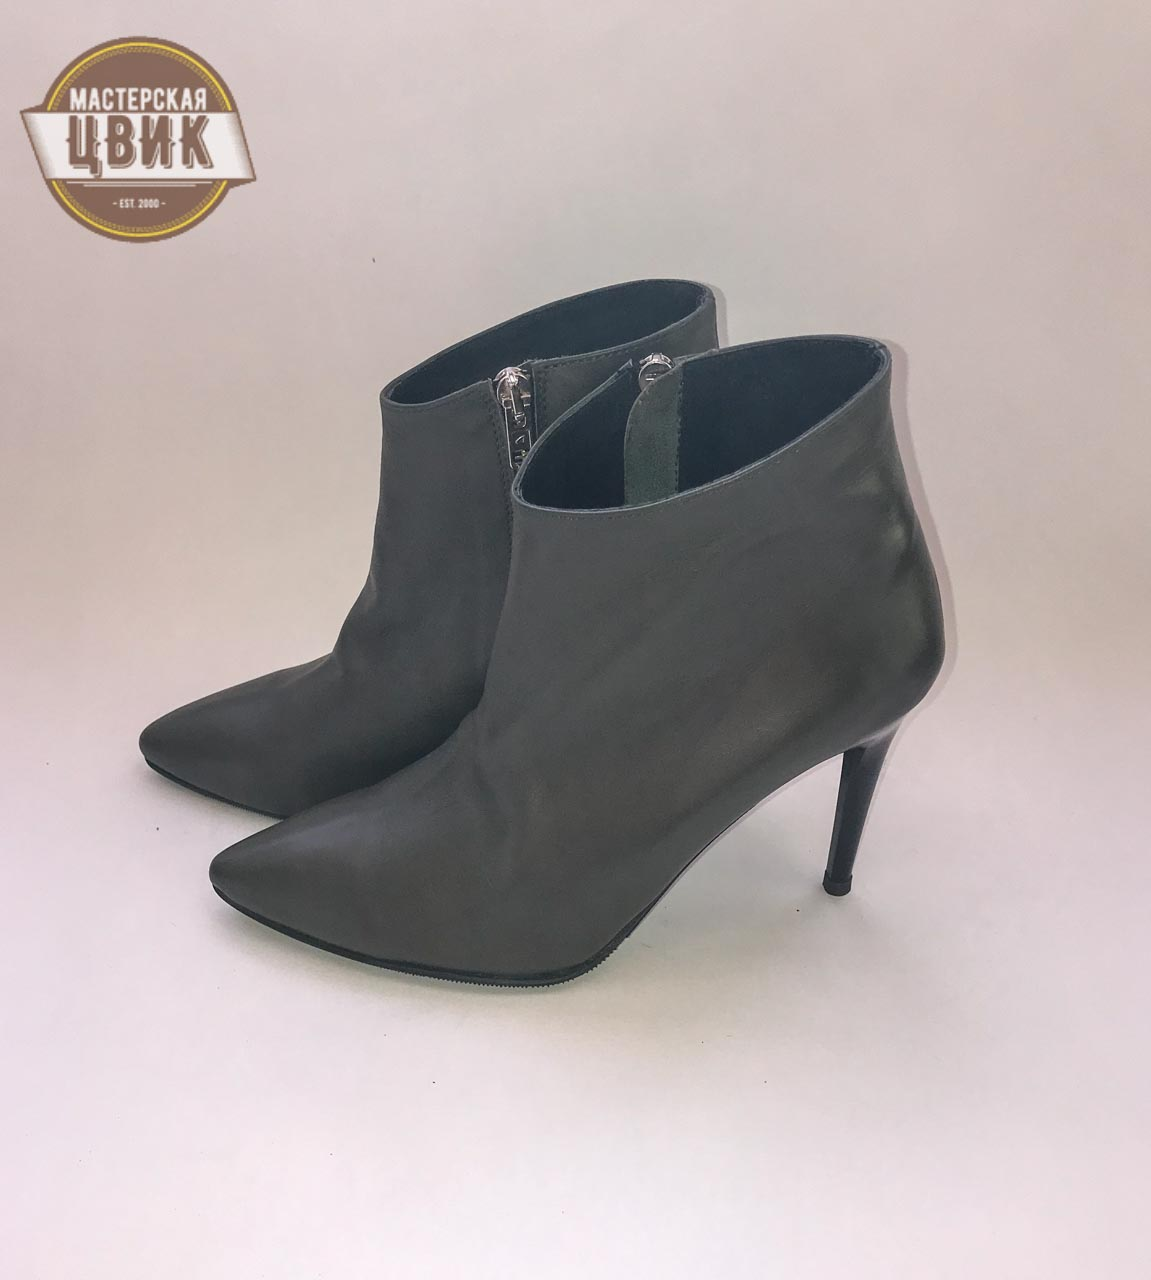 individualnyj-poshiv-obuvi-minsk-41 Индивидуальный пошив обуви Минск-41